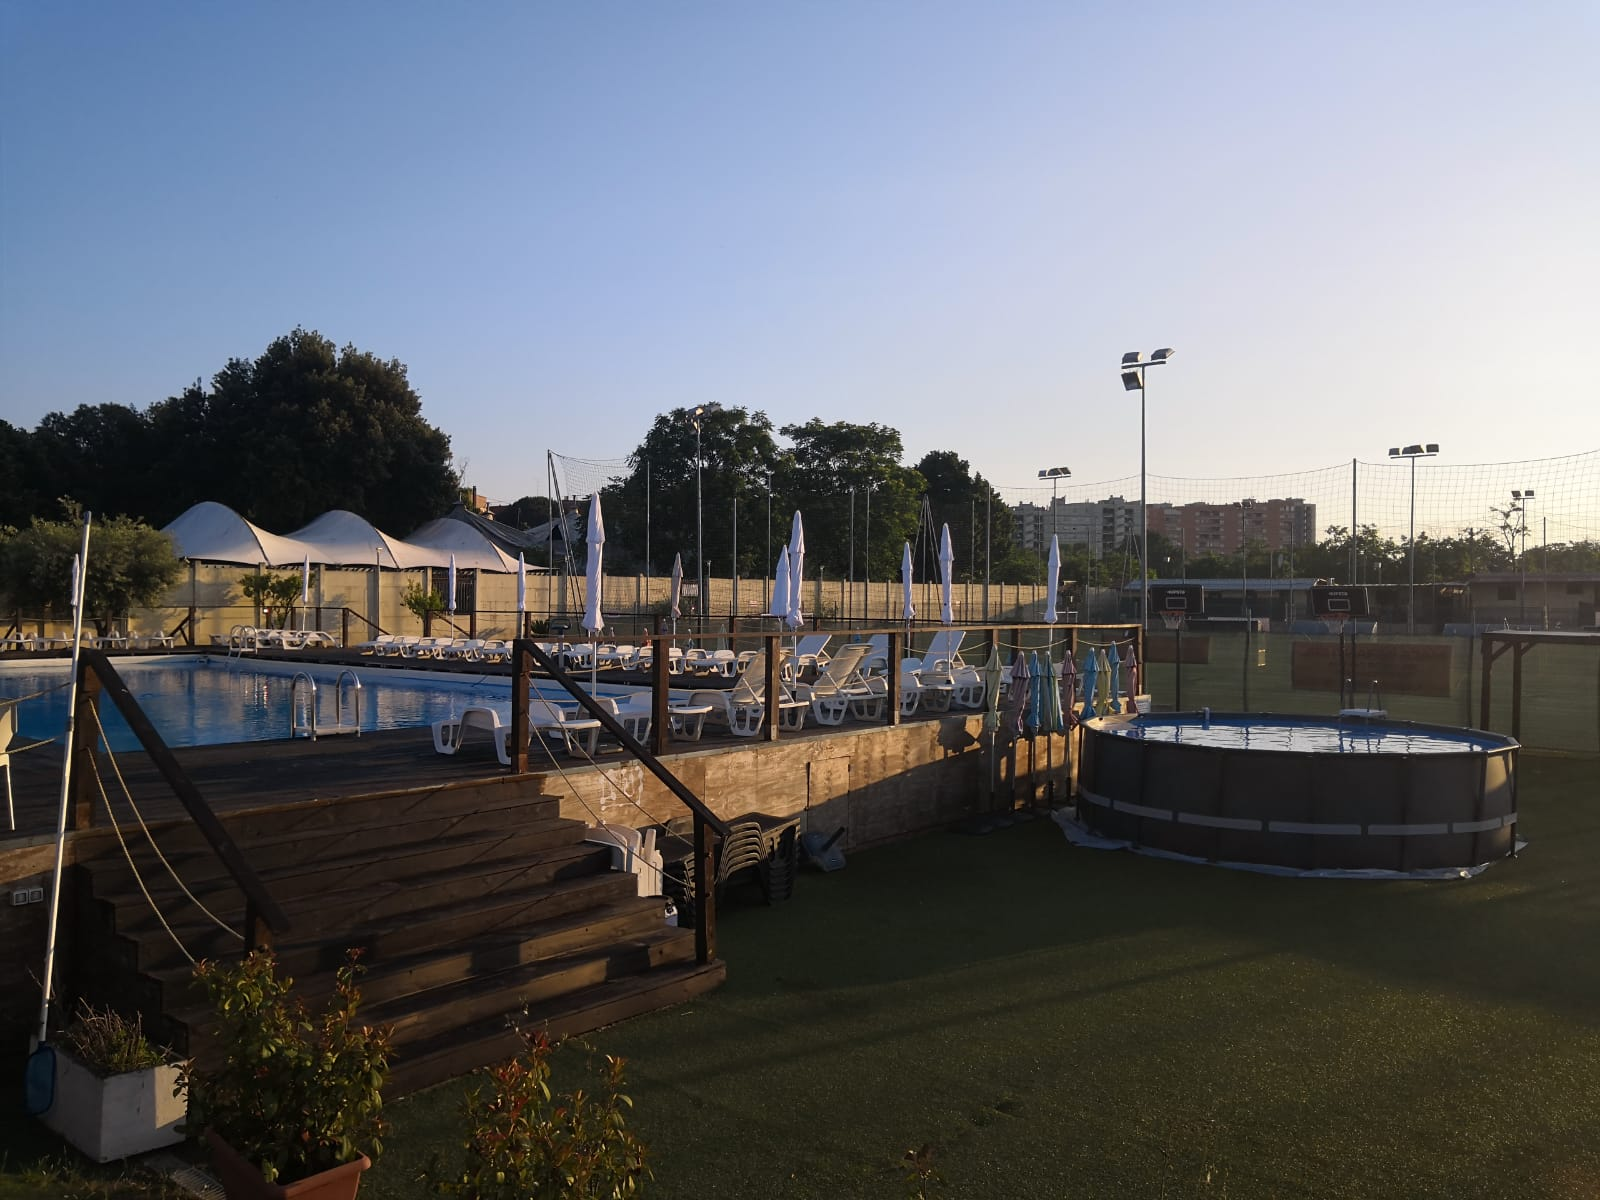 centocellefc piscina 2019 - 18